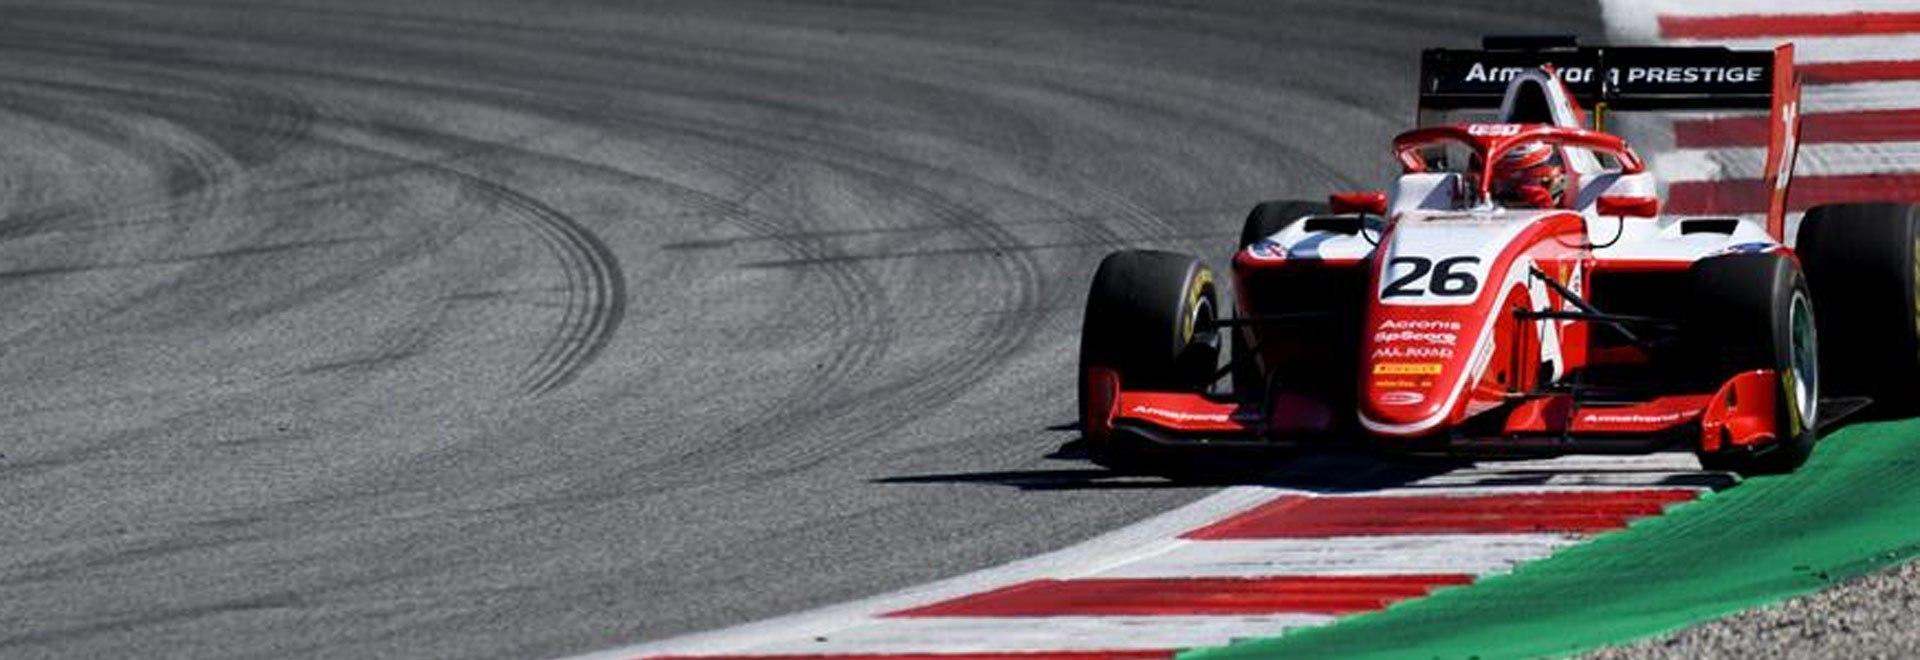 GP Toscana. Gara 2